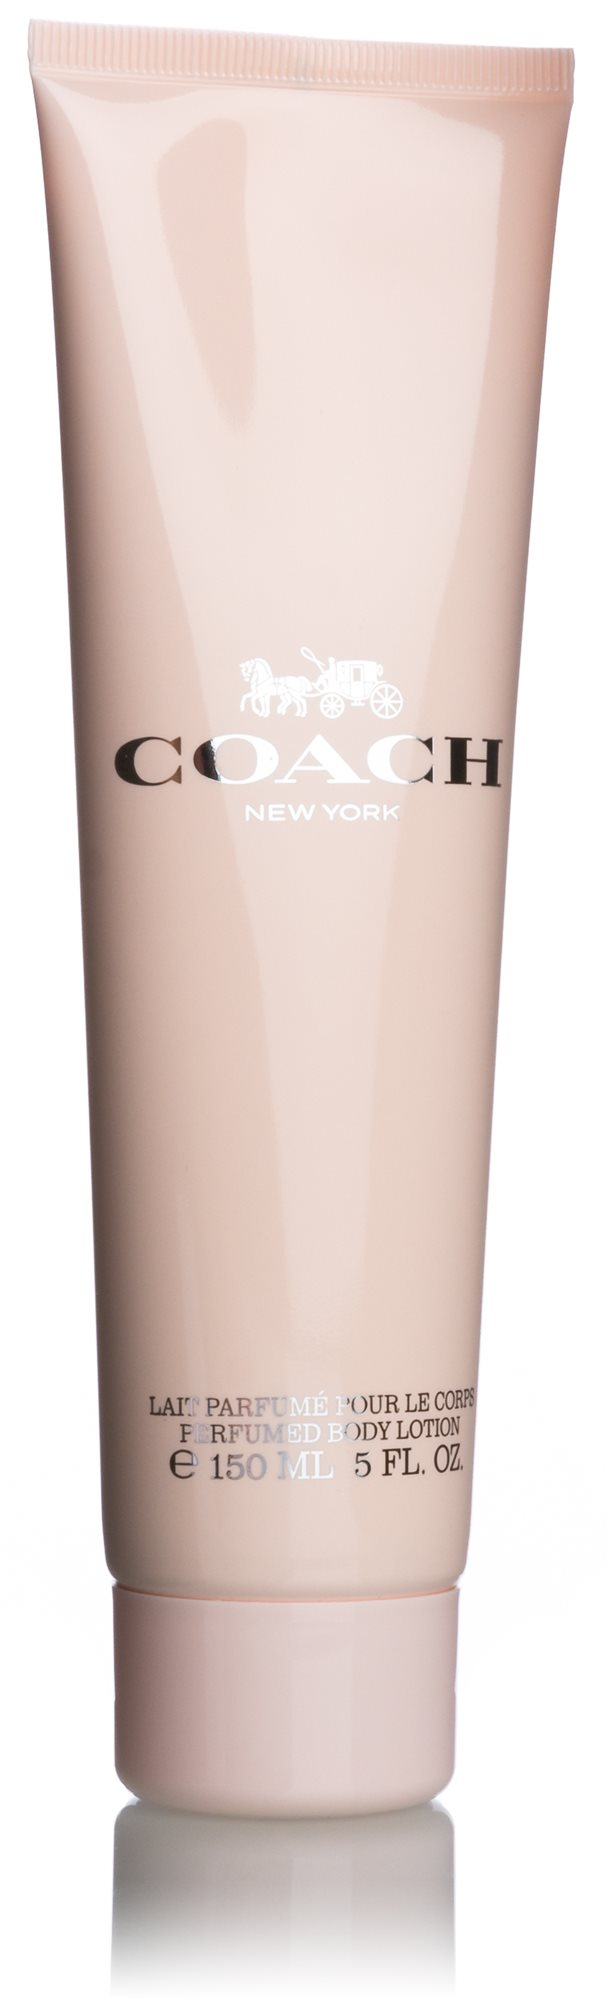 COACH EdT Perfumed Body Lotion 150 ml